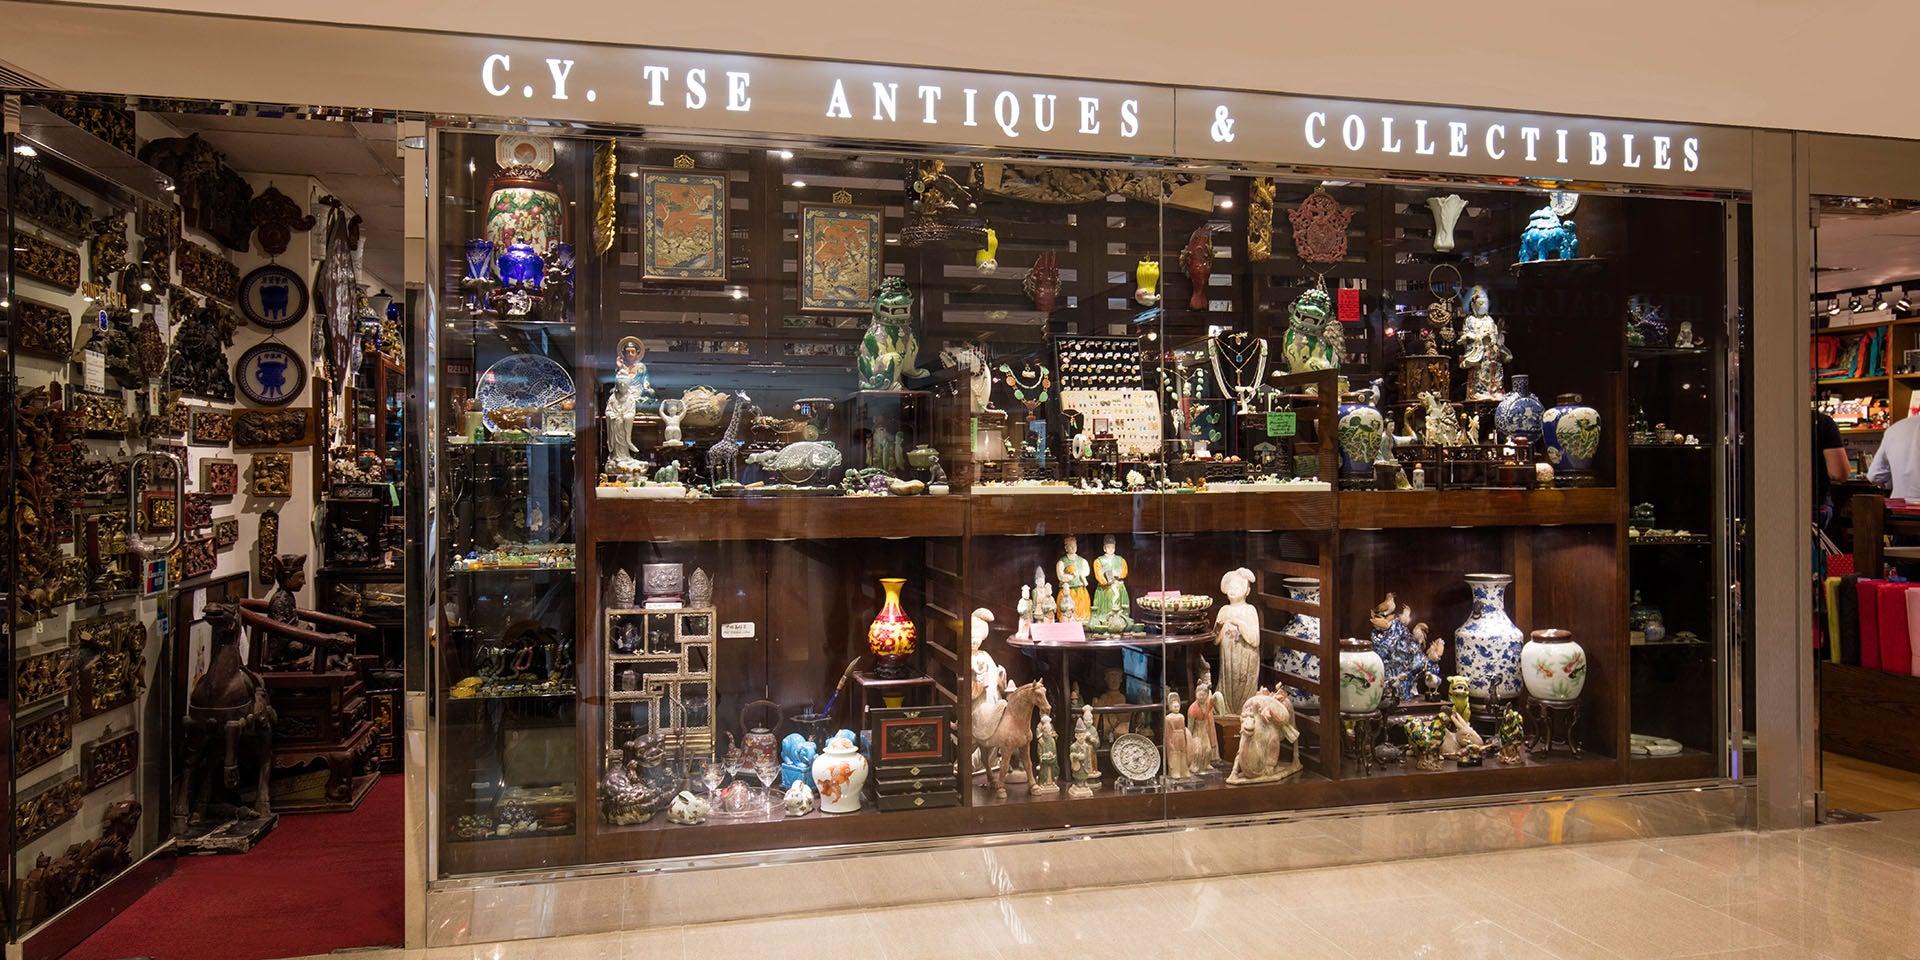 C.Y. Tse Antiques & Collectibles | LANDMARK